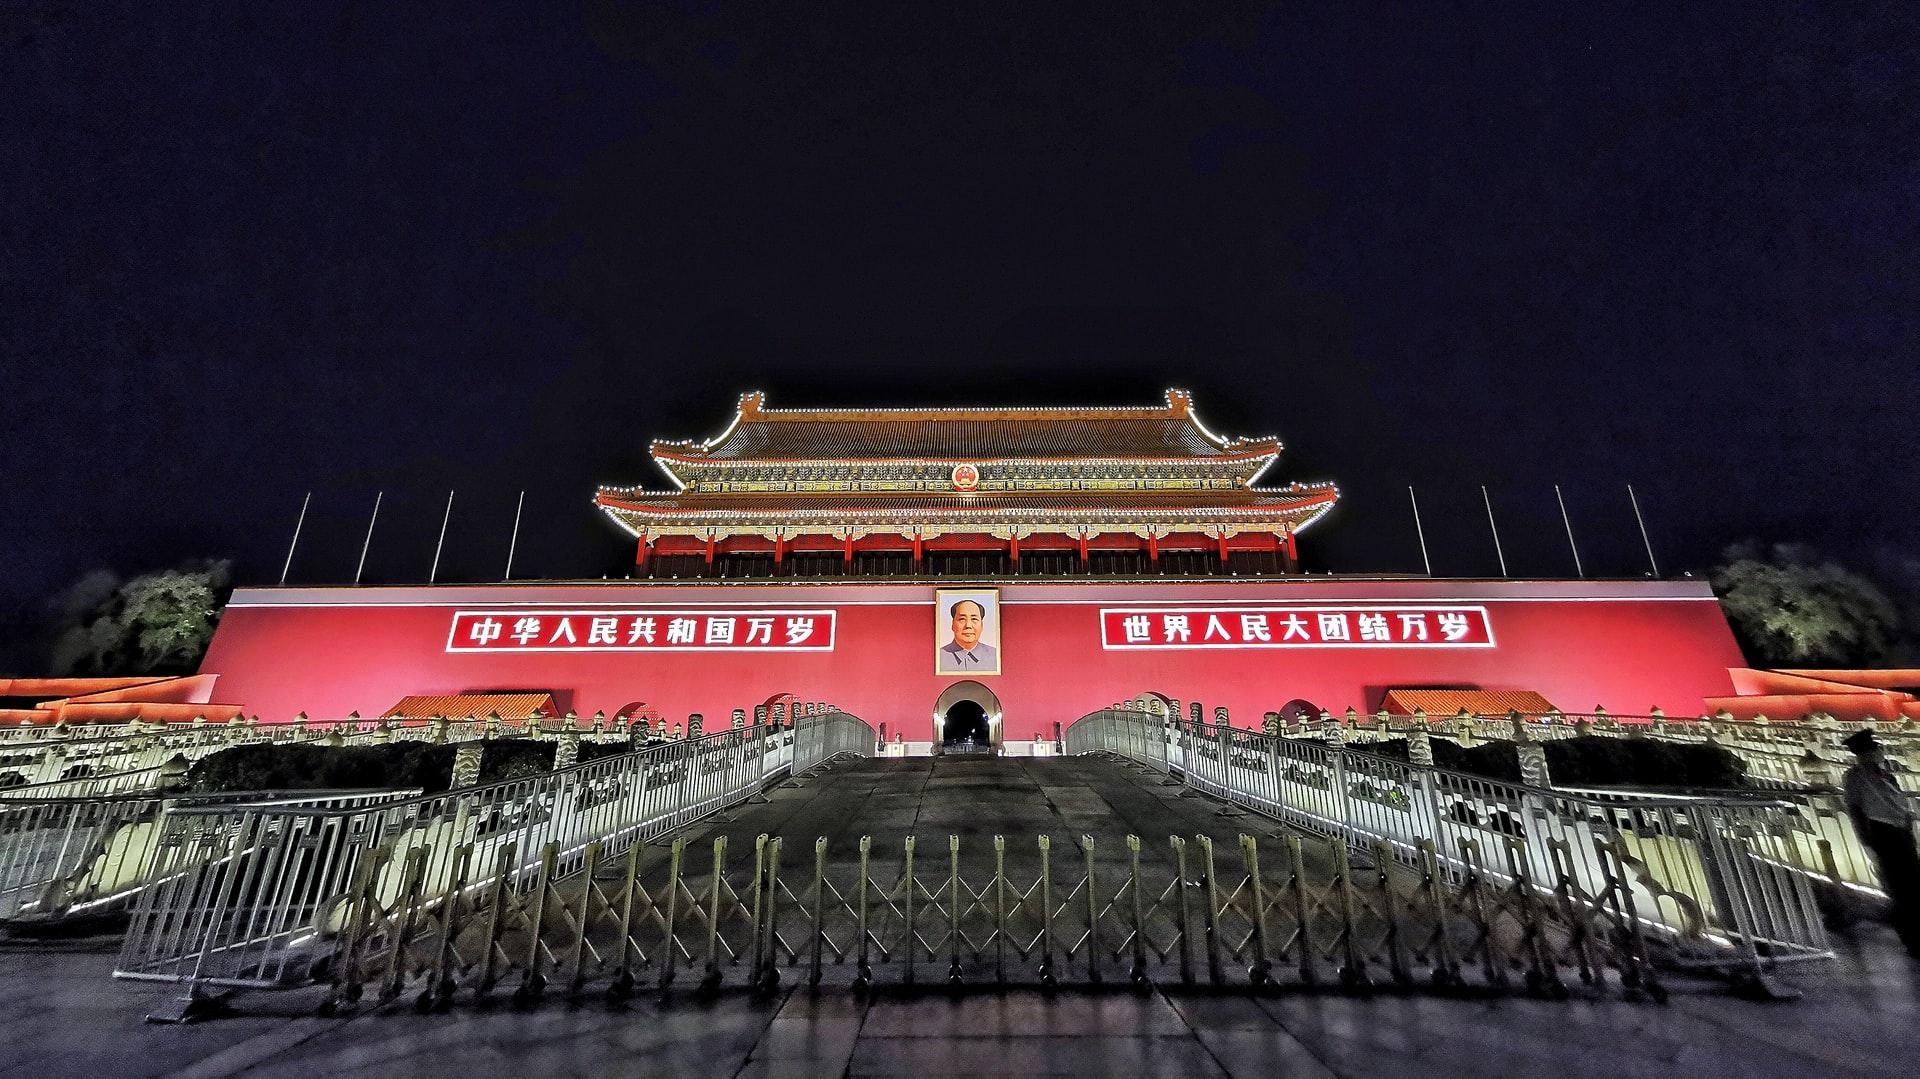 Tiananmen Copypasta Pastowo Com A protest event held in the square on june 4, 1989. tiananmen copypasta pastowo com